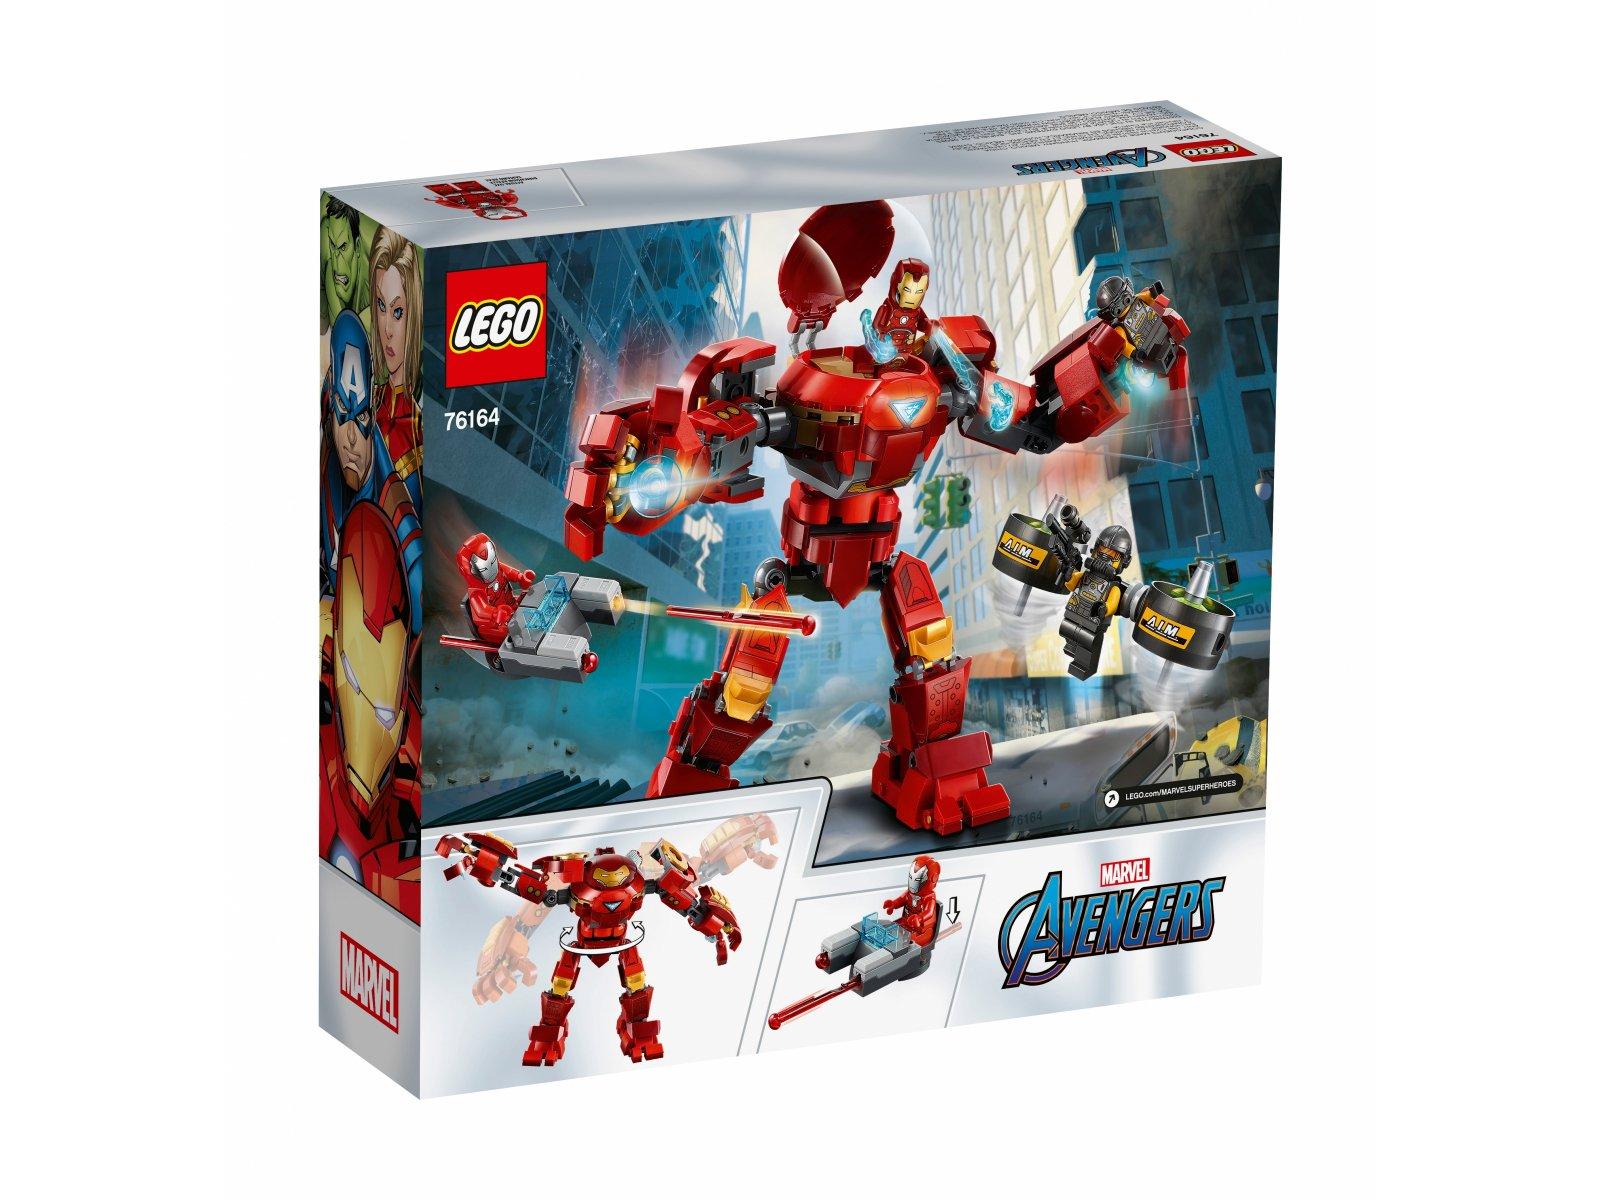 LEGO 76164 Marvel Avengers Hulkbuster Iron Mana kontra agenci A.I.M.